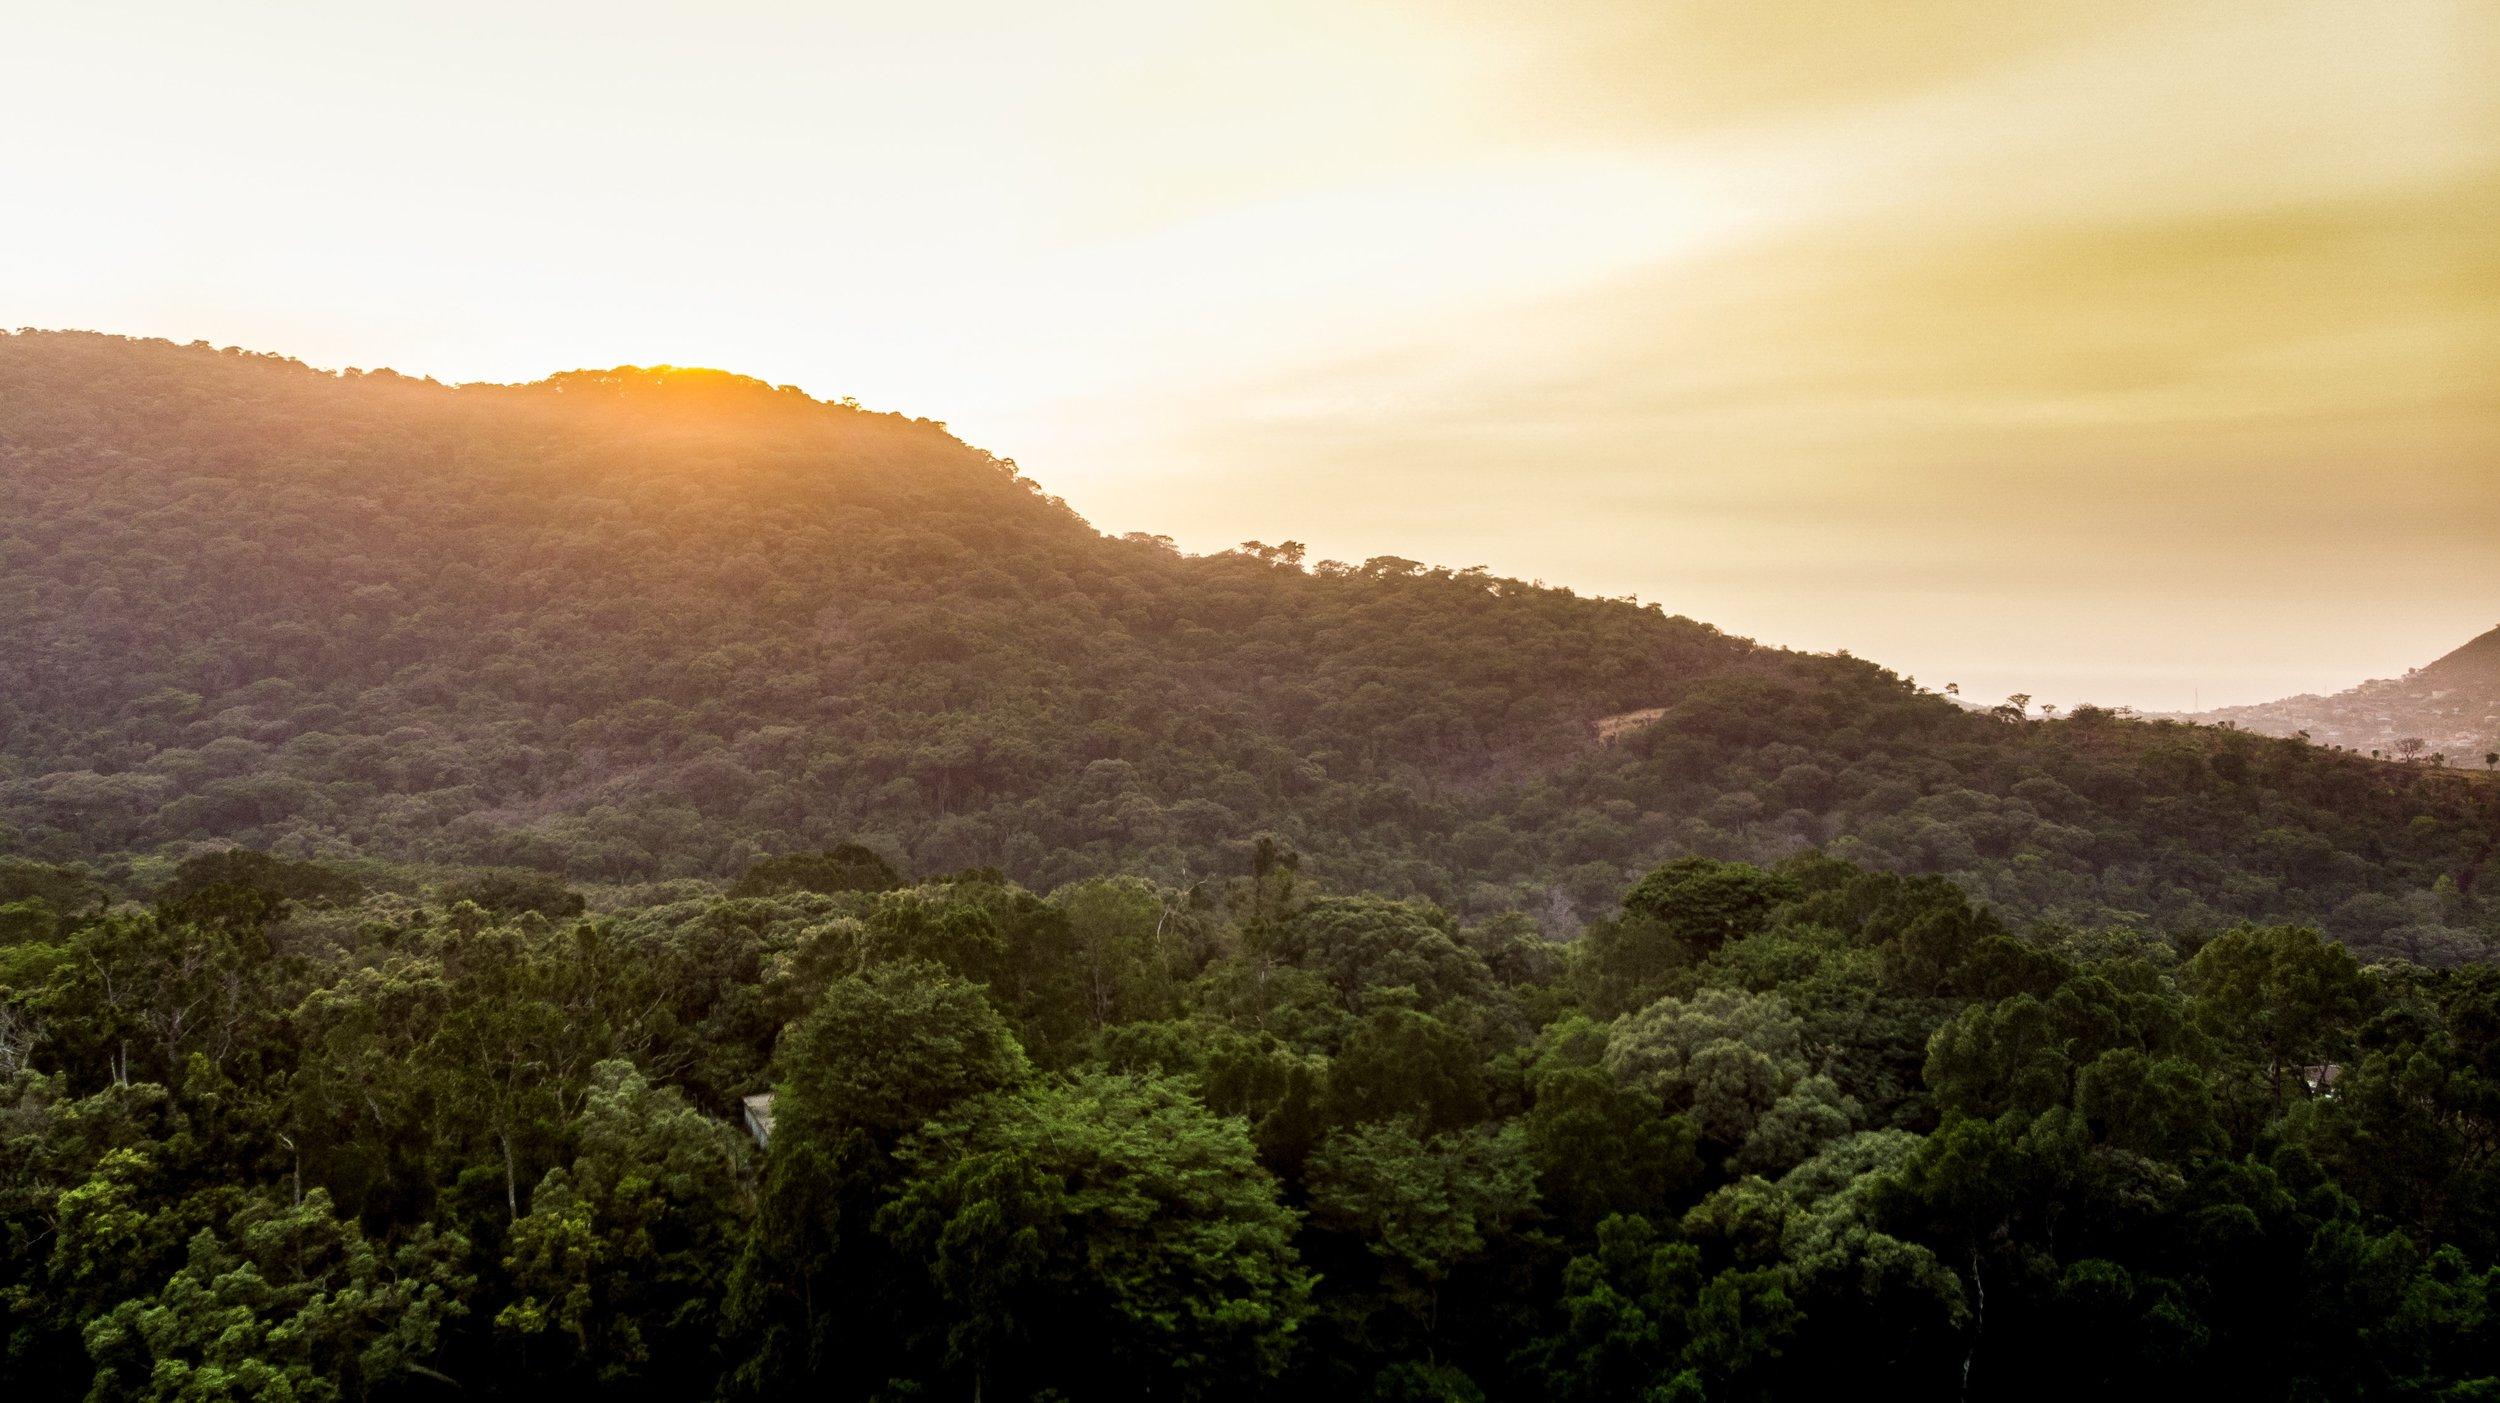 Sierraleone-vickieremoe-environment-rainforest-conservation-photos-radwanskeiky4.JPG